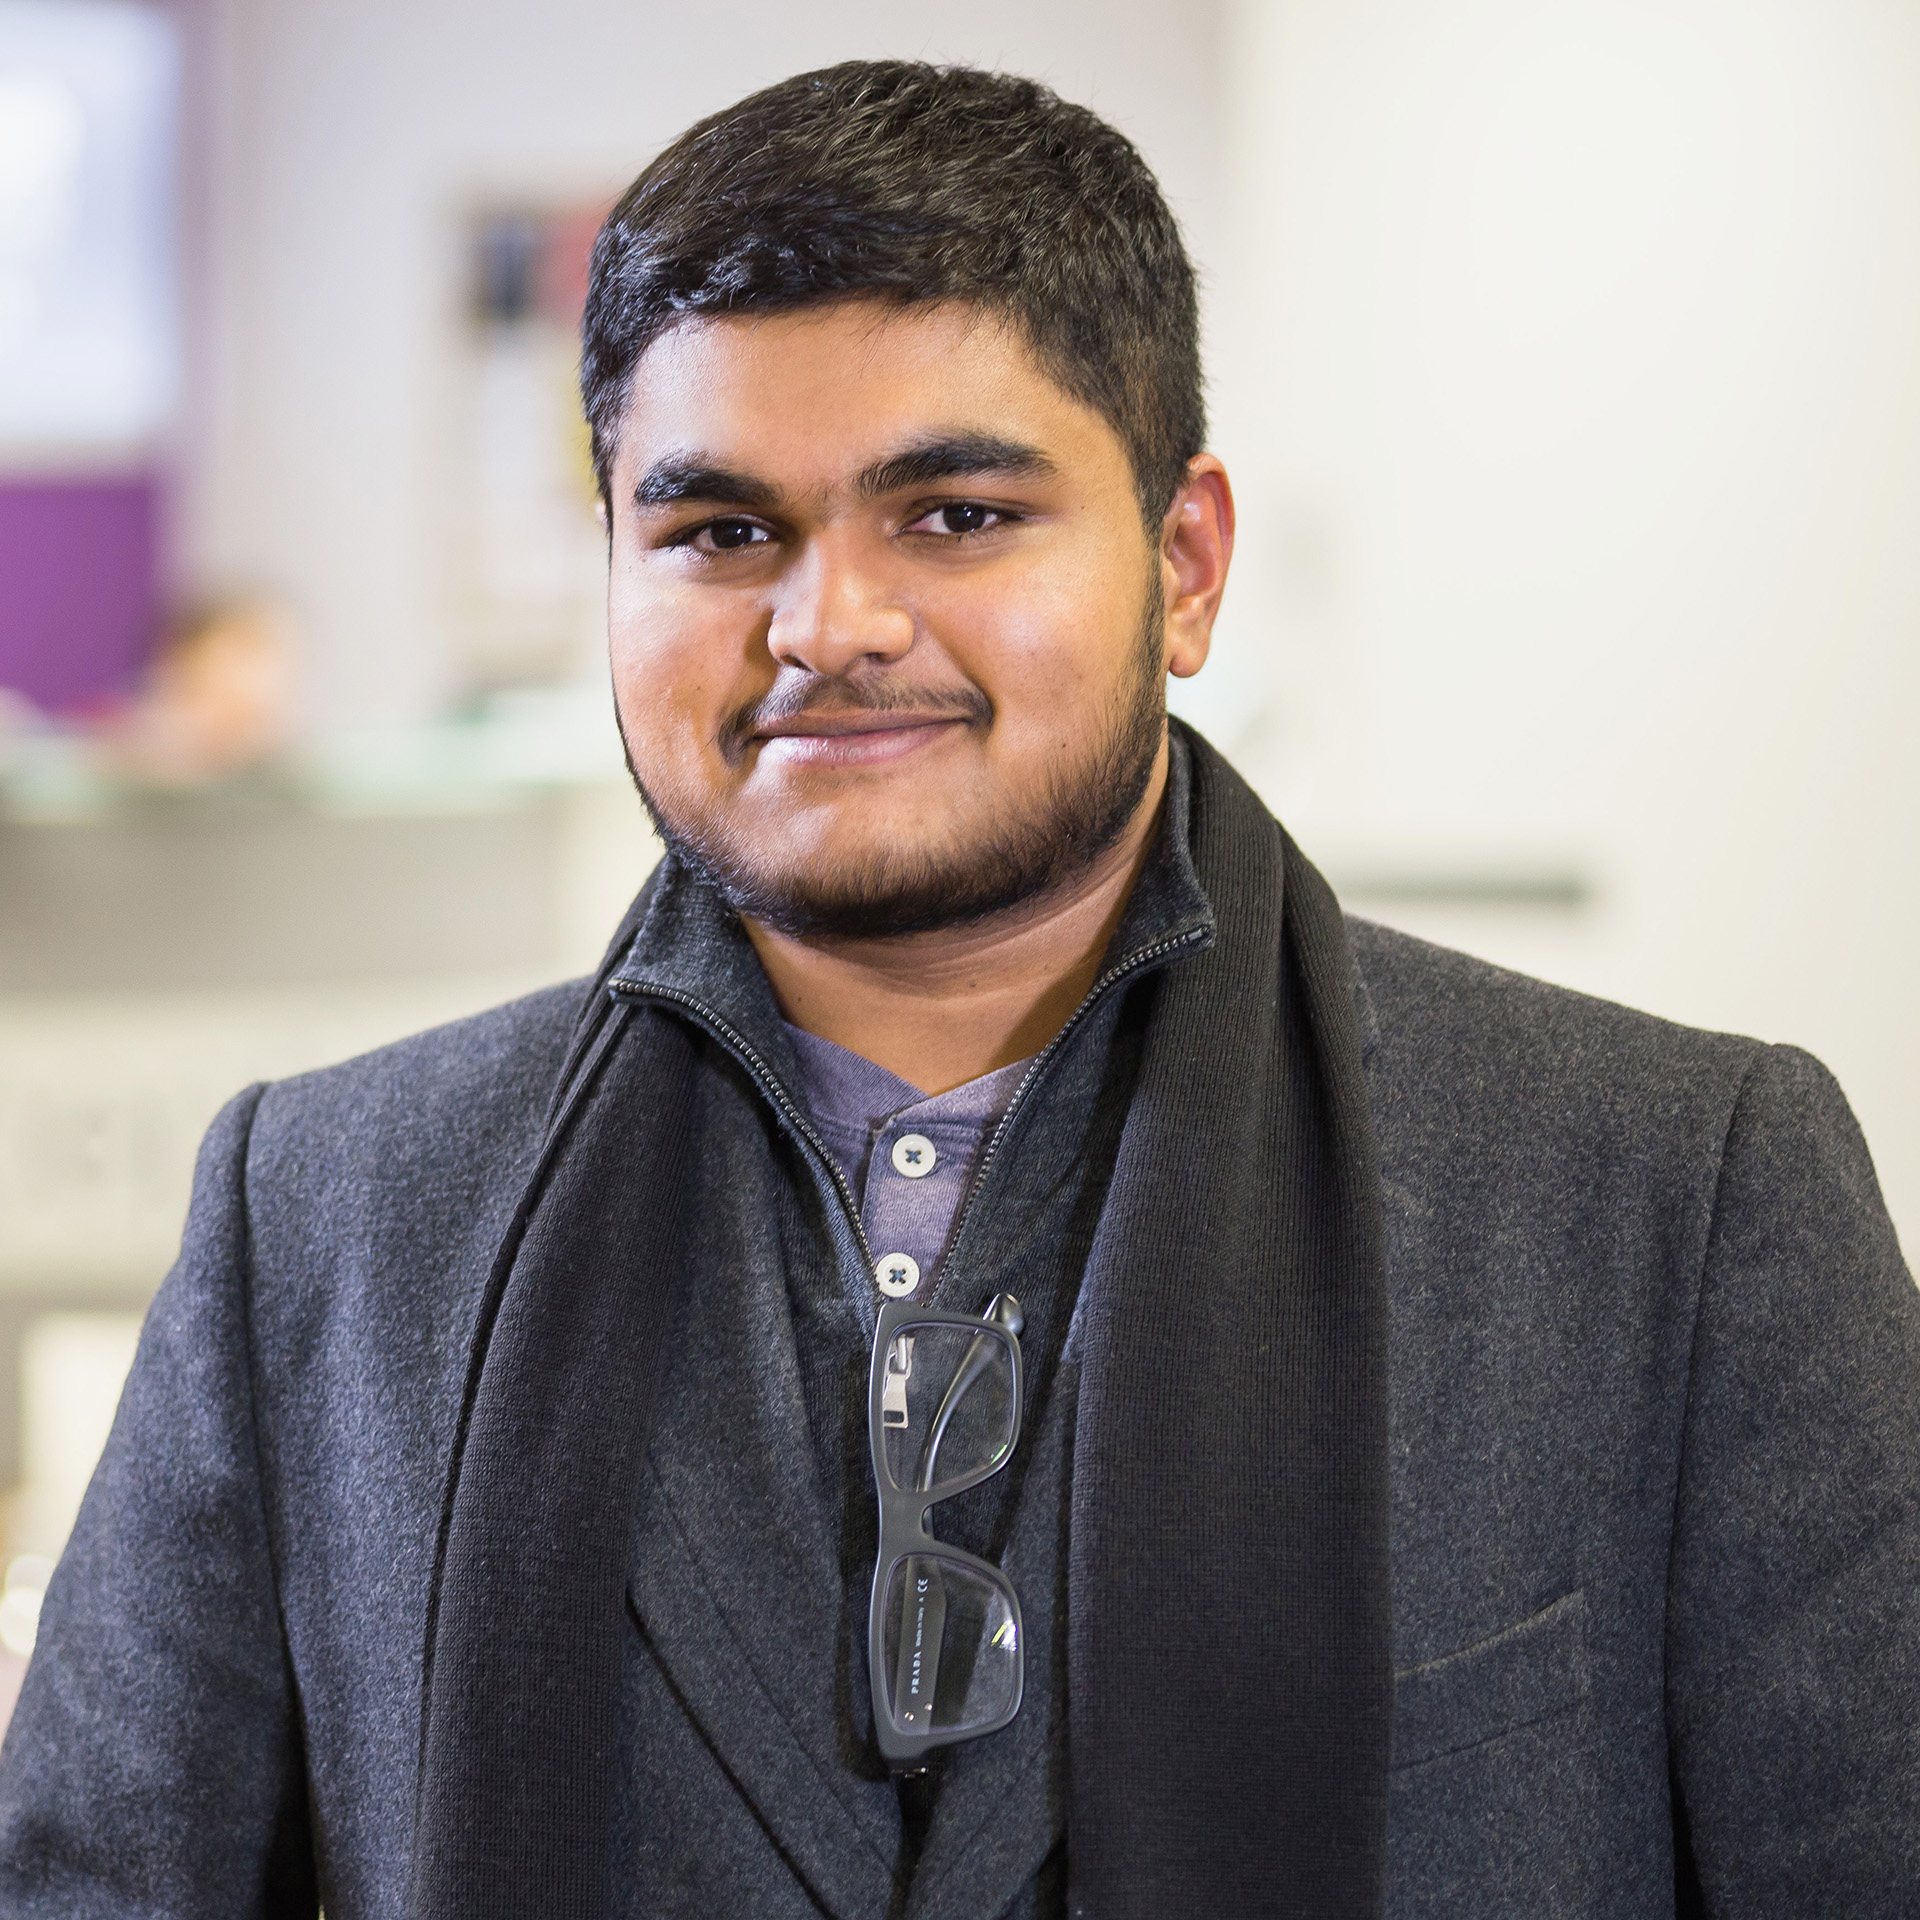 Photo of international student Muhammed at INTO City, University of London